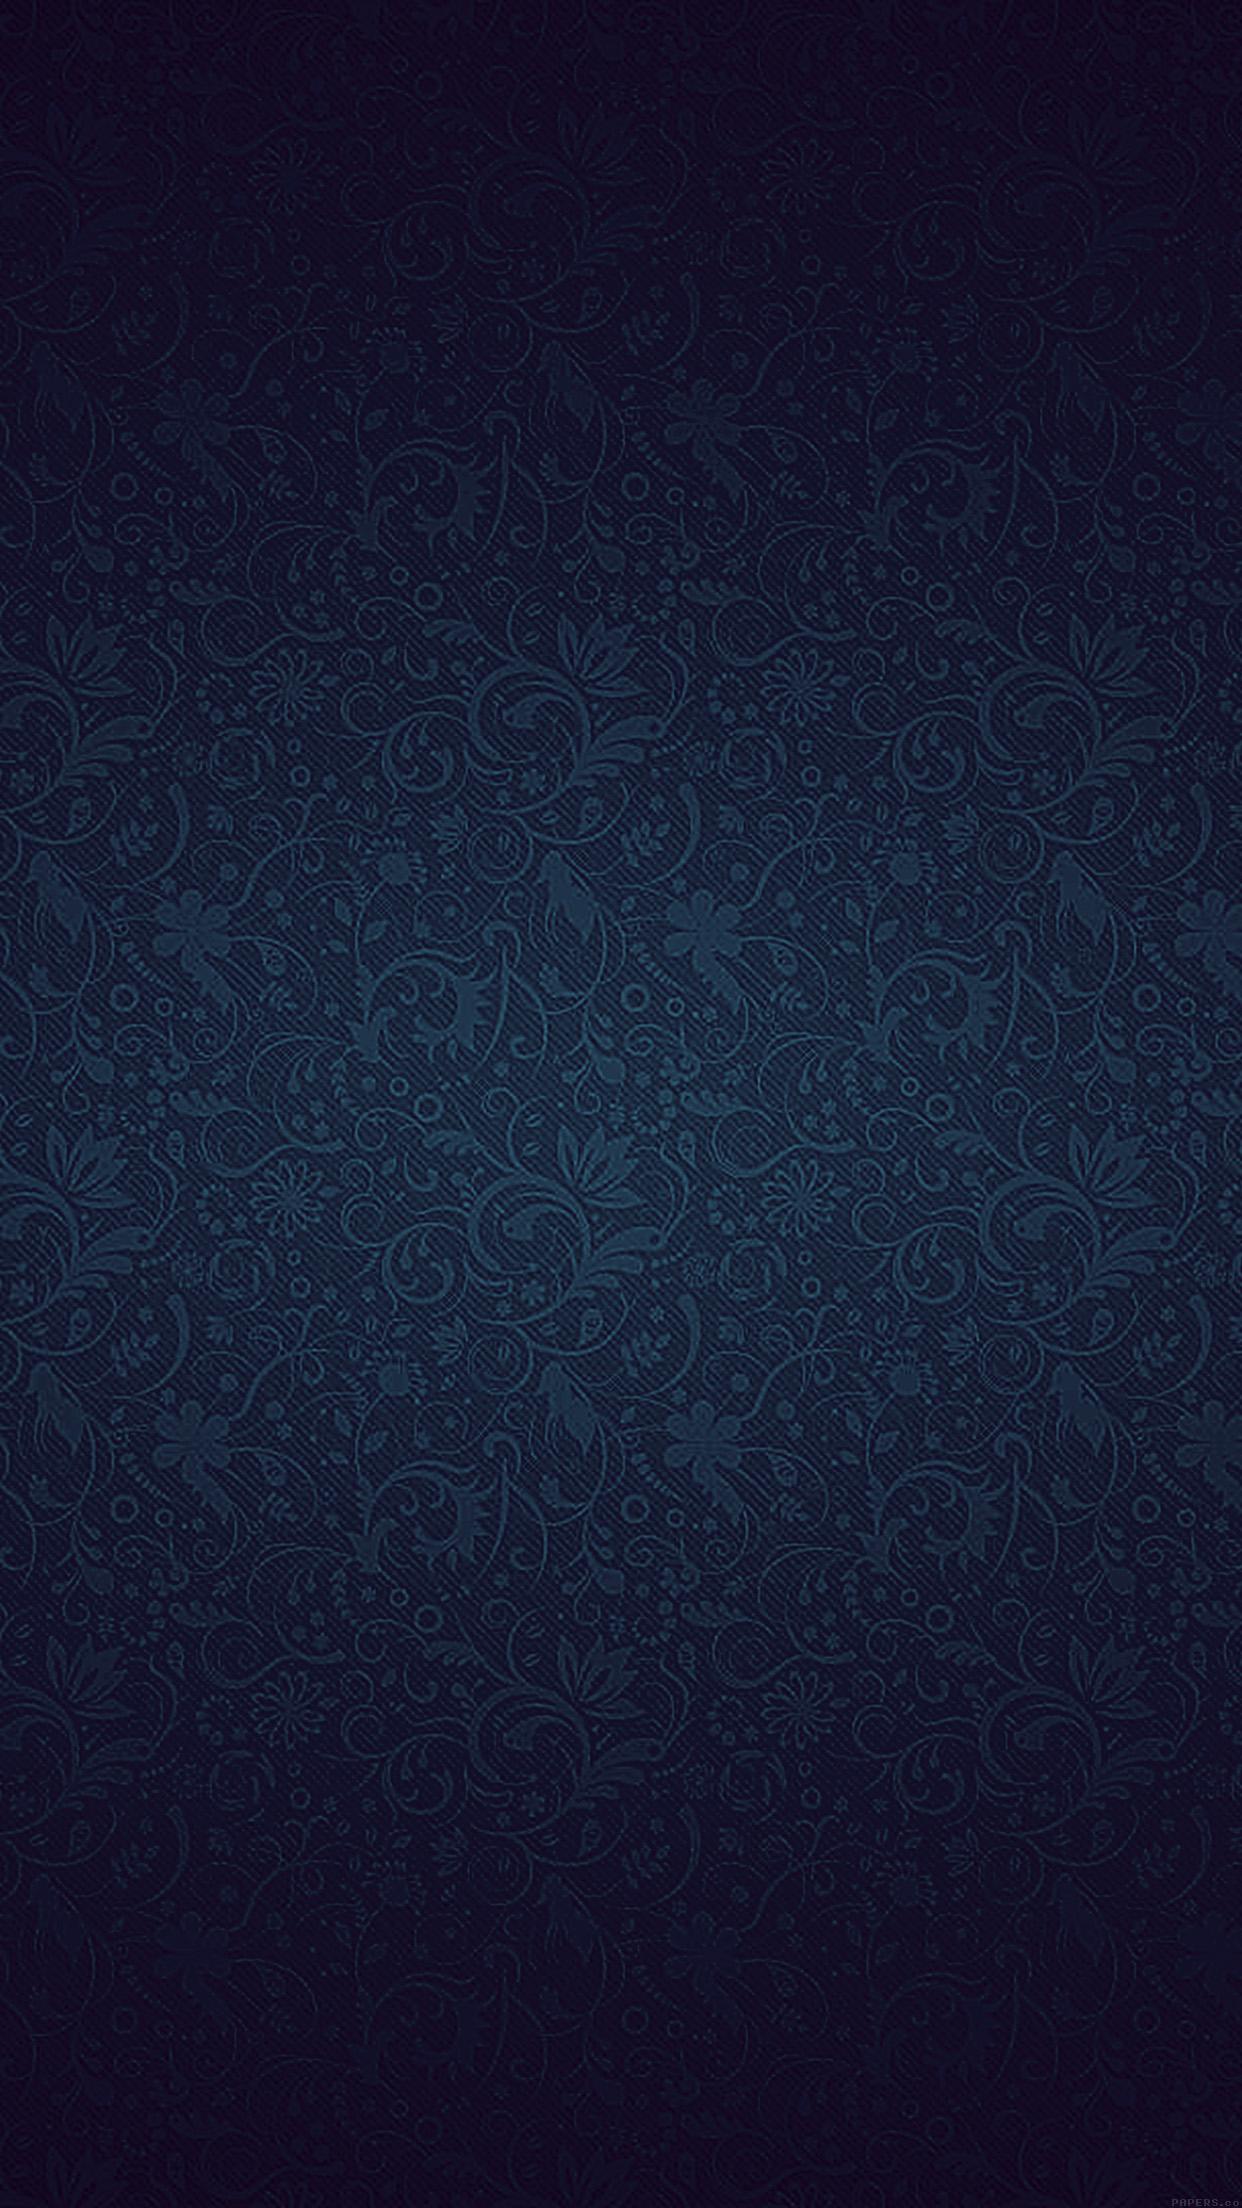 Vf81 Dark Blue Ornament Texture Pattern